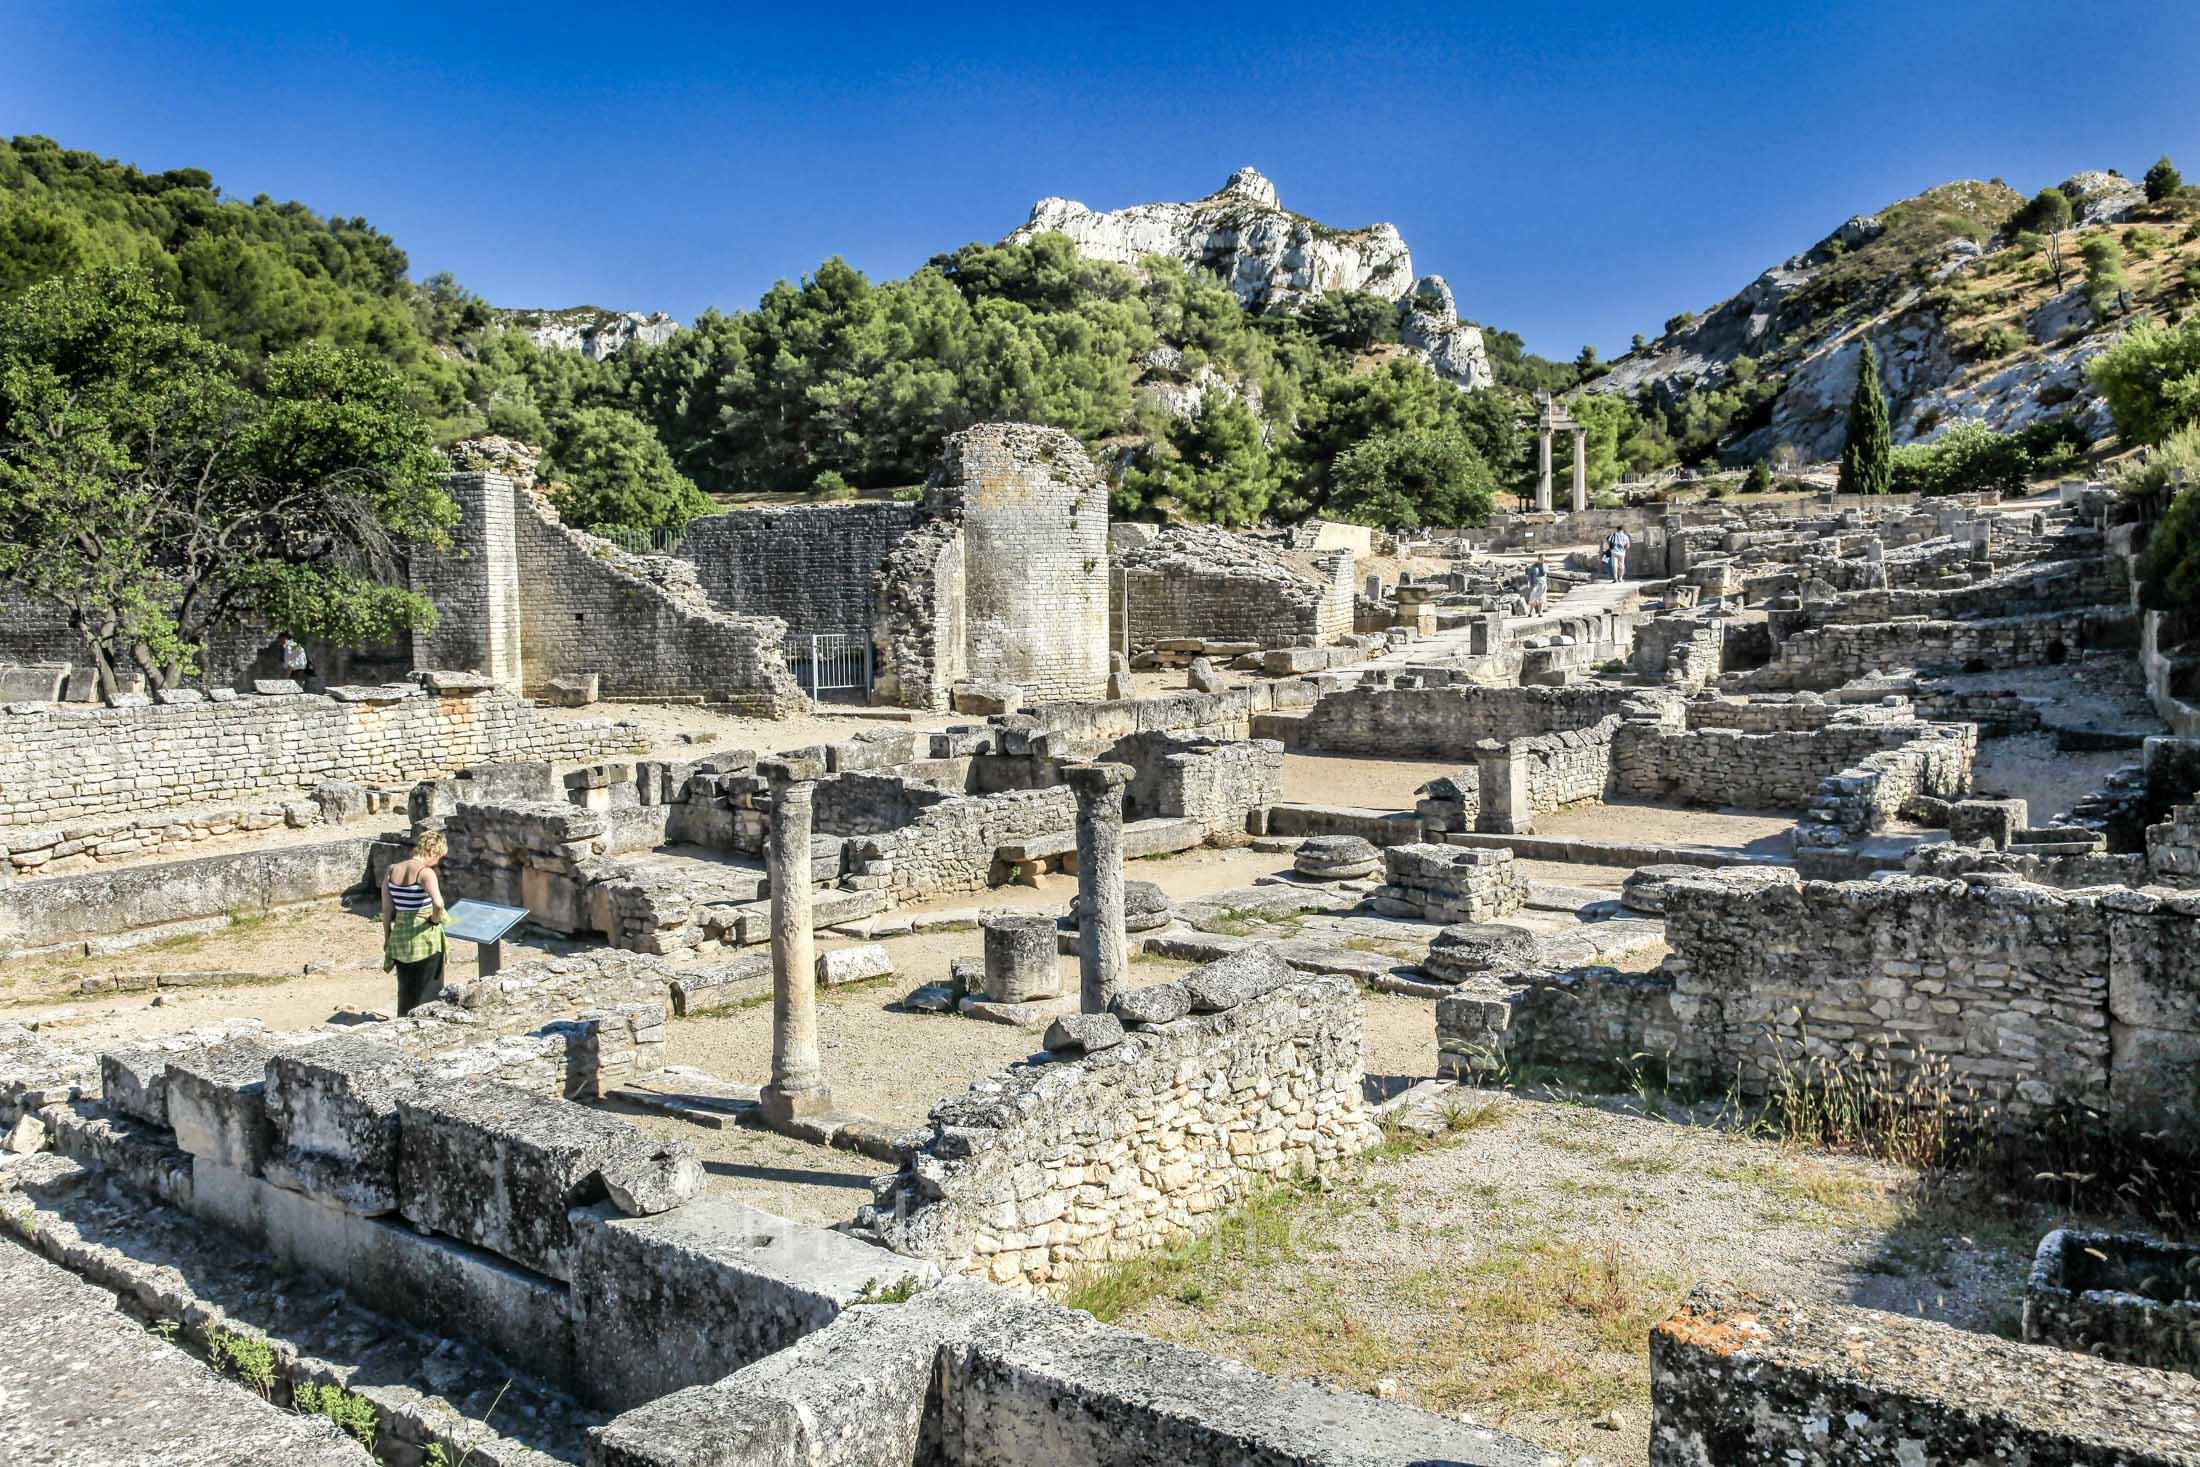 Roman remains at Glanum